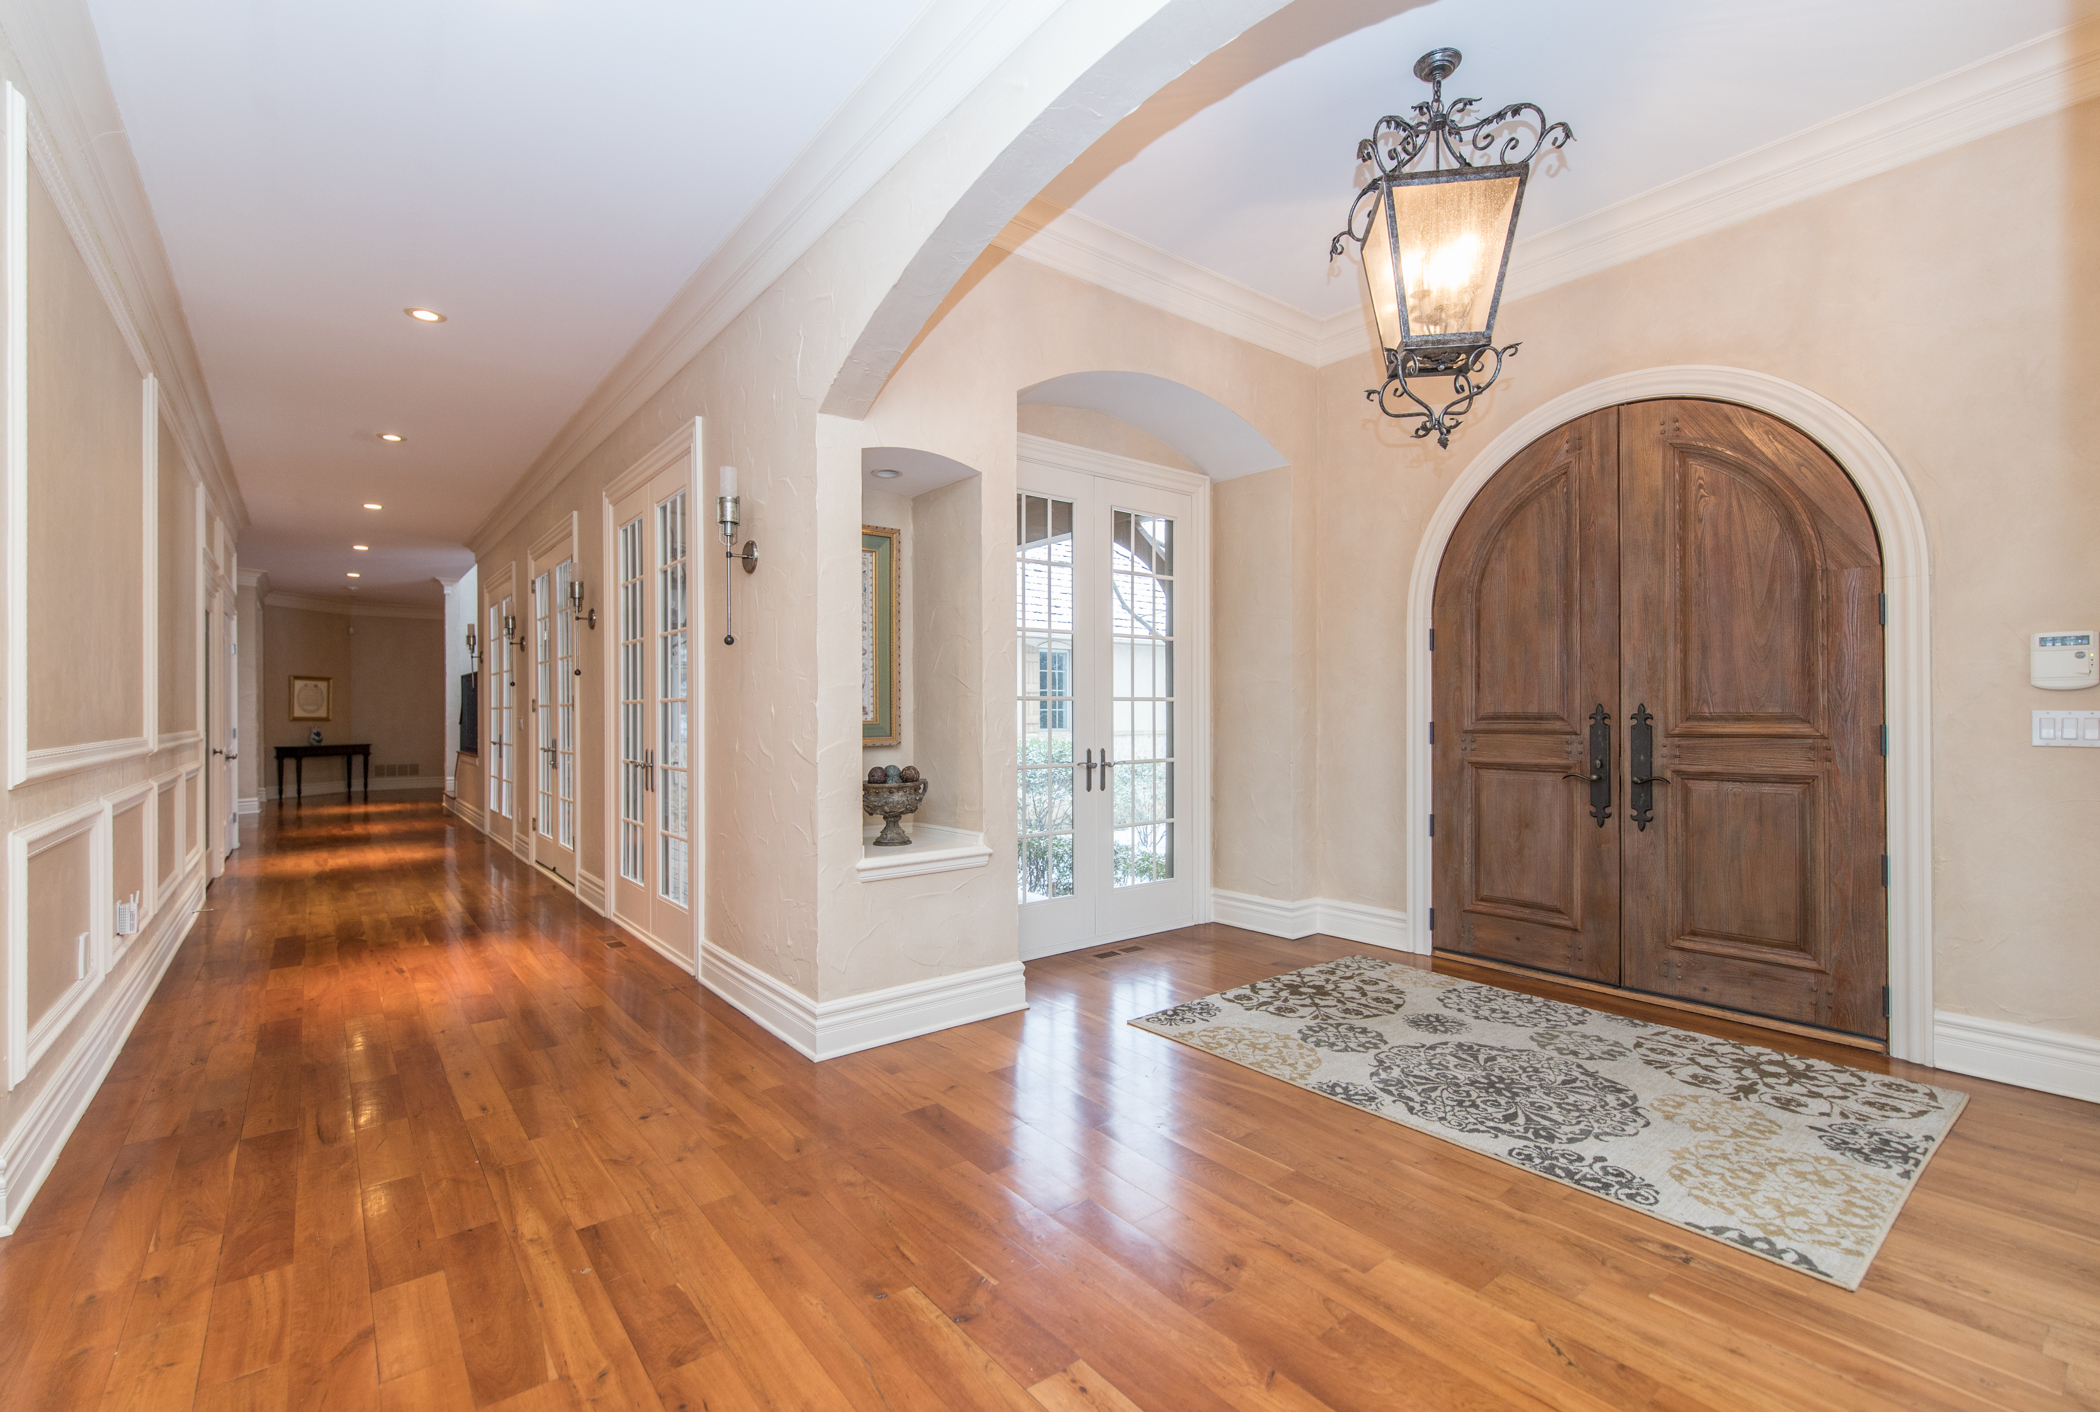 Wide halls & cherry plank floors